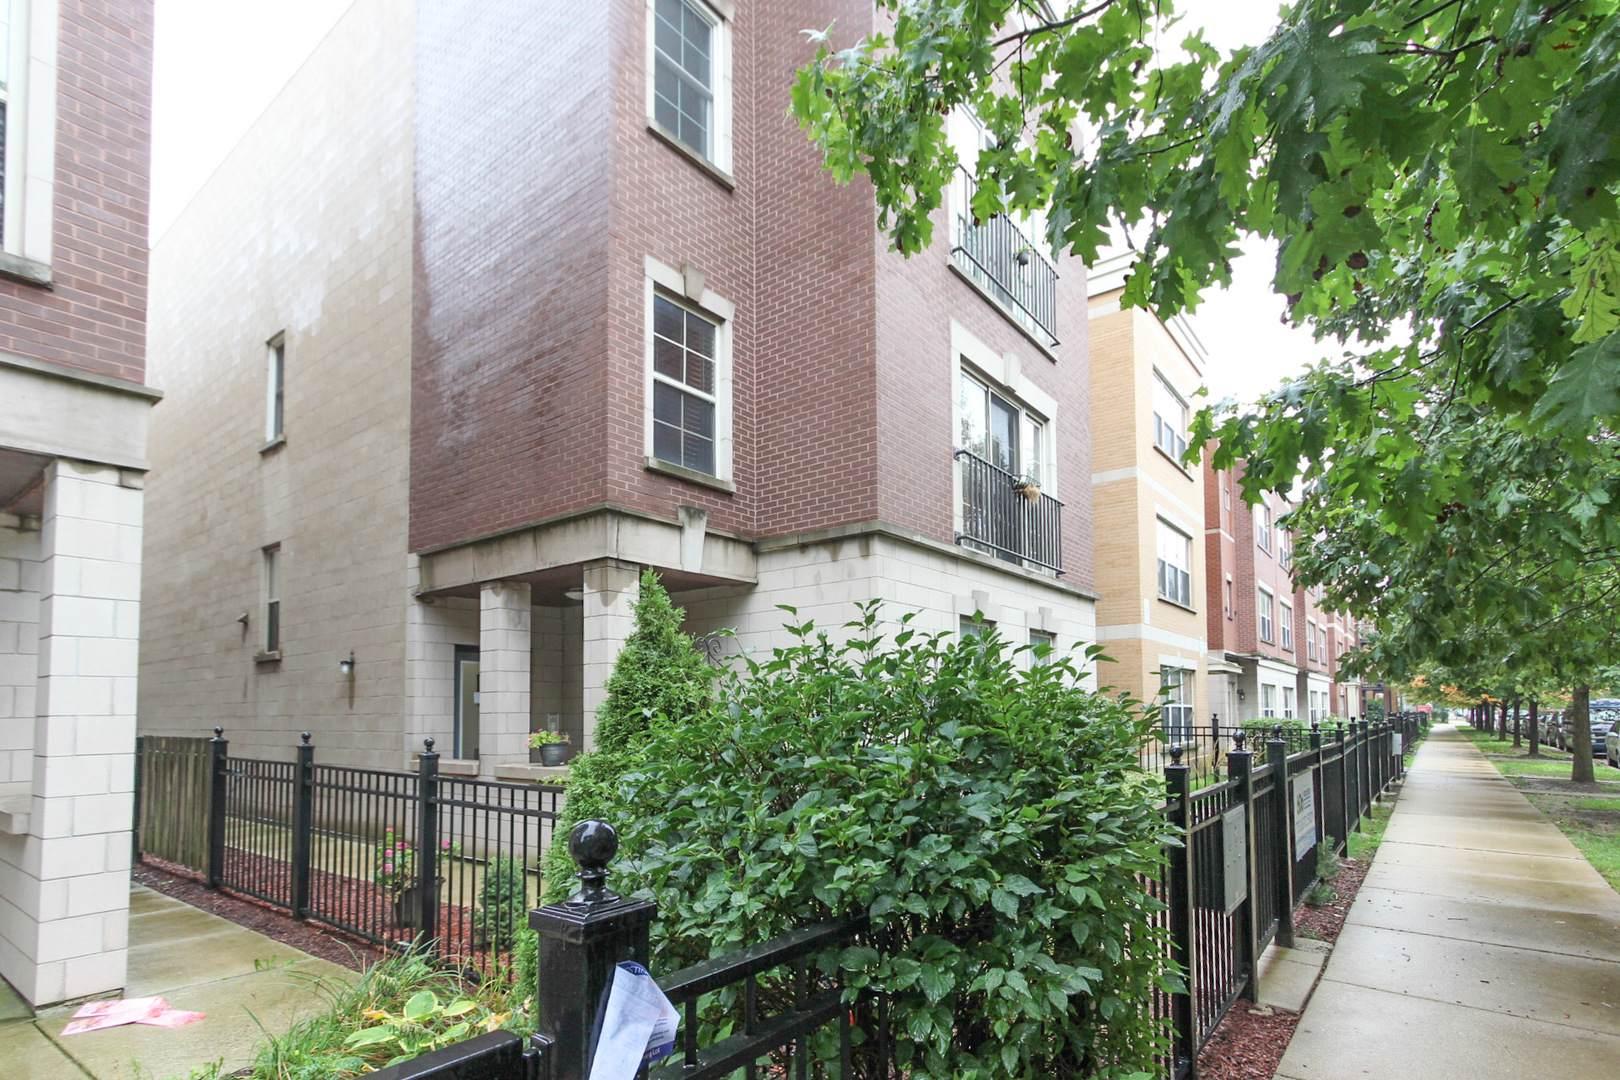 1129 W Washburne Avenue #101, Chicago, IL 60608 (MLS #10857125) :: John Lyons Real Estate